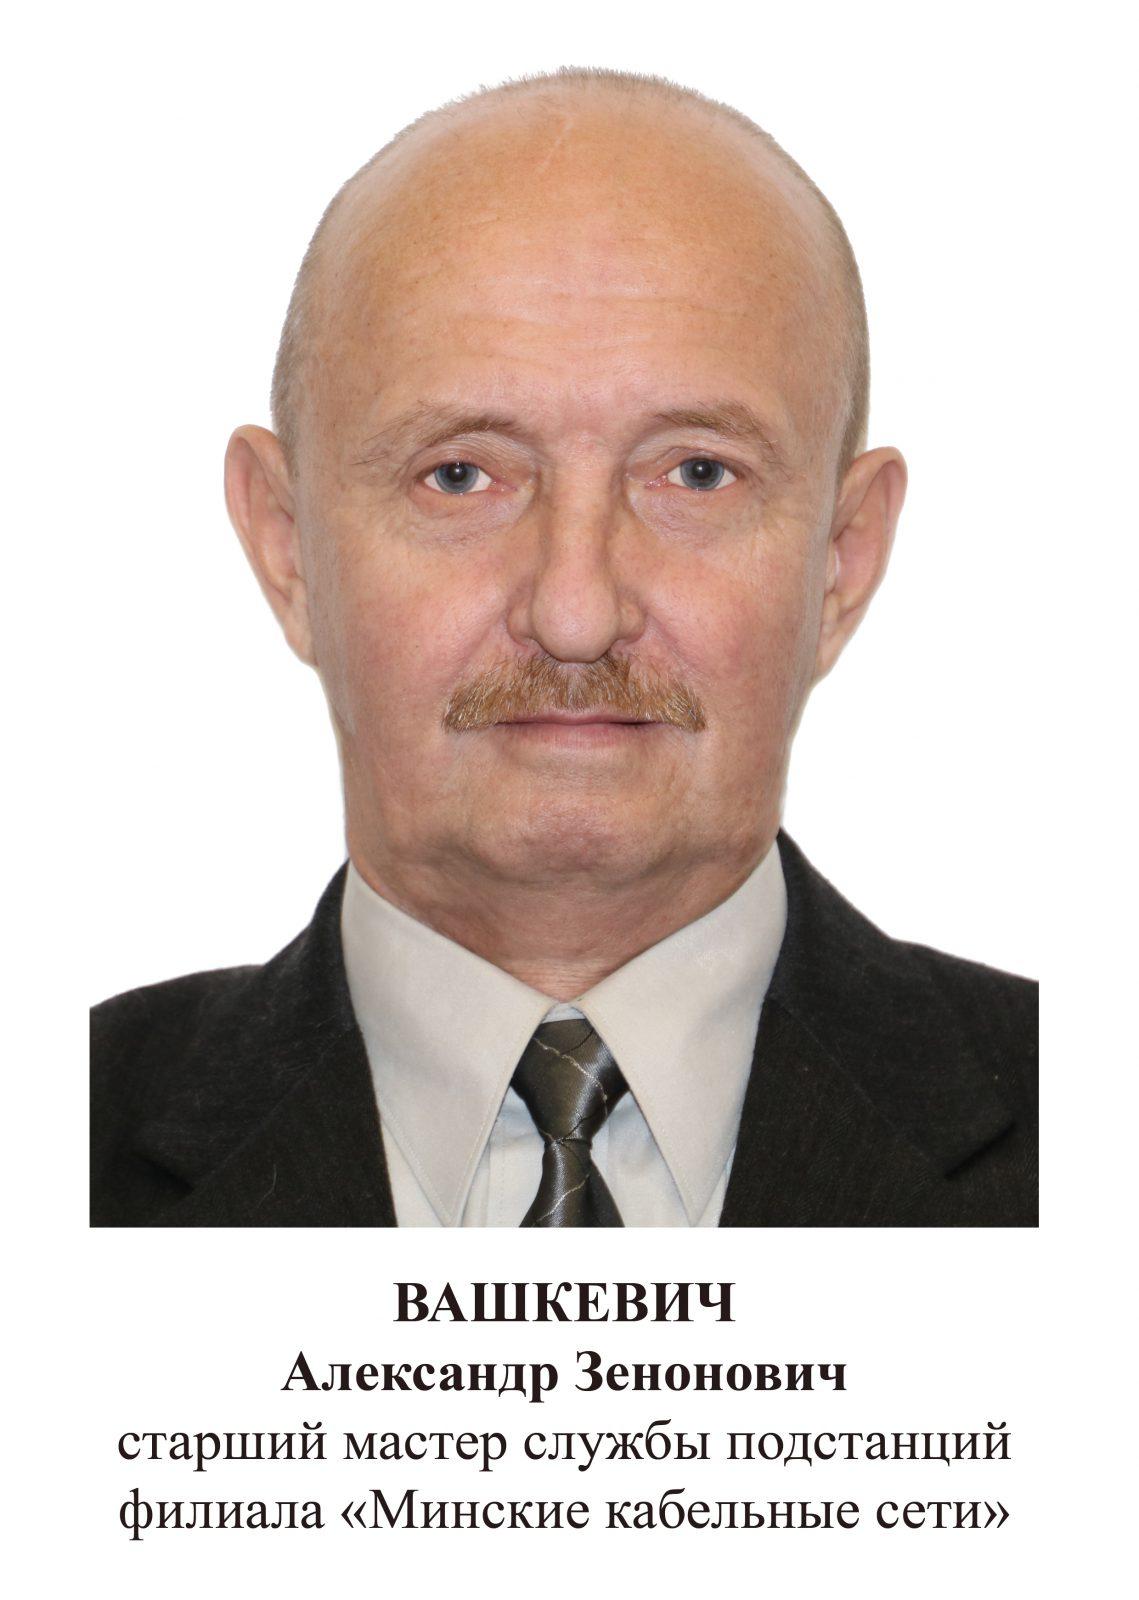 Вашкевич Александр Зенонович